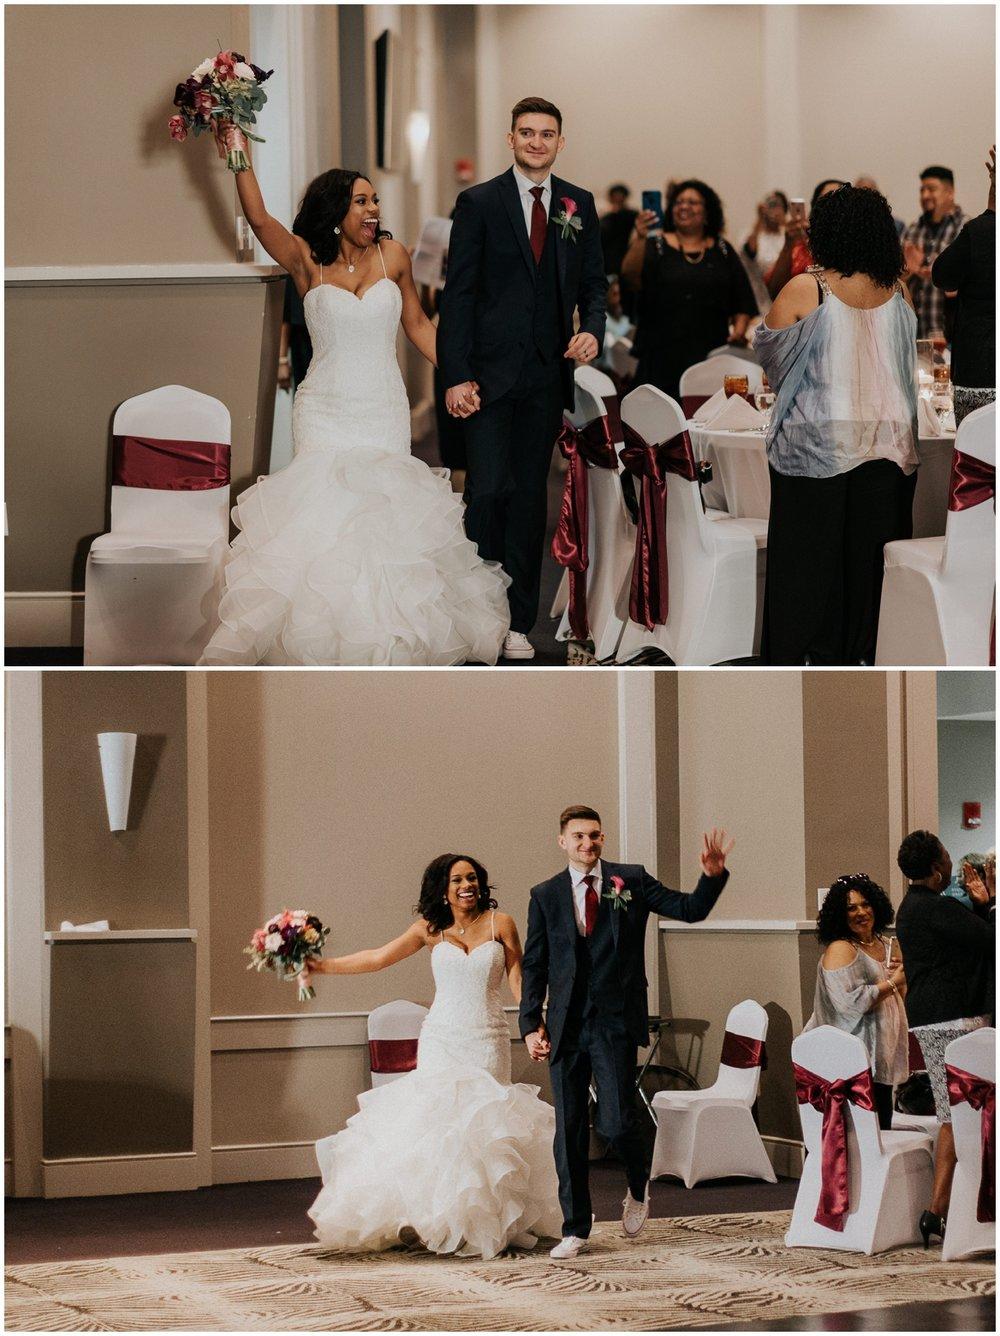 shipley_memphis_wedding_photographer_65.jpg